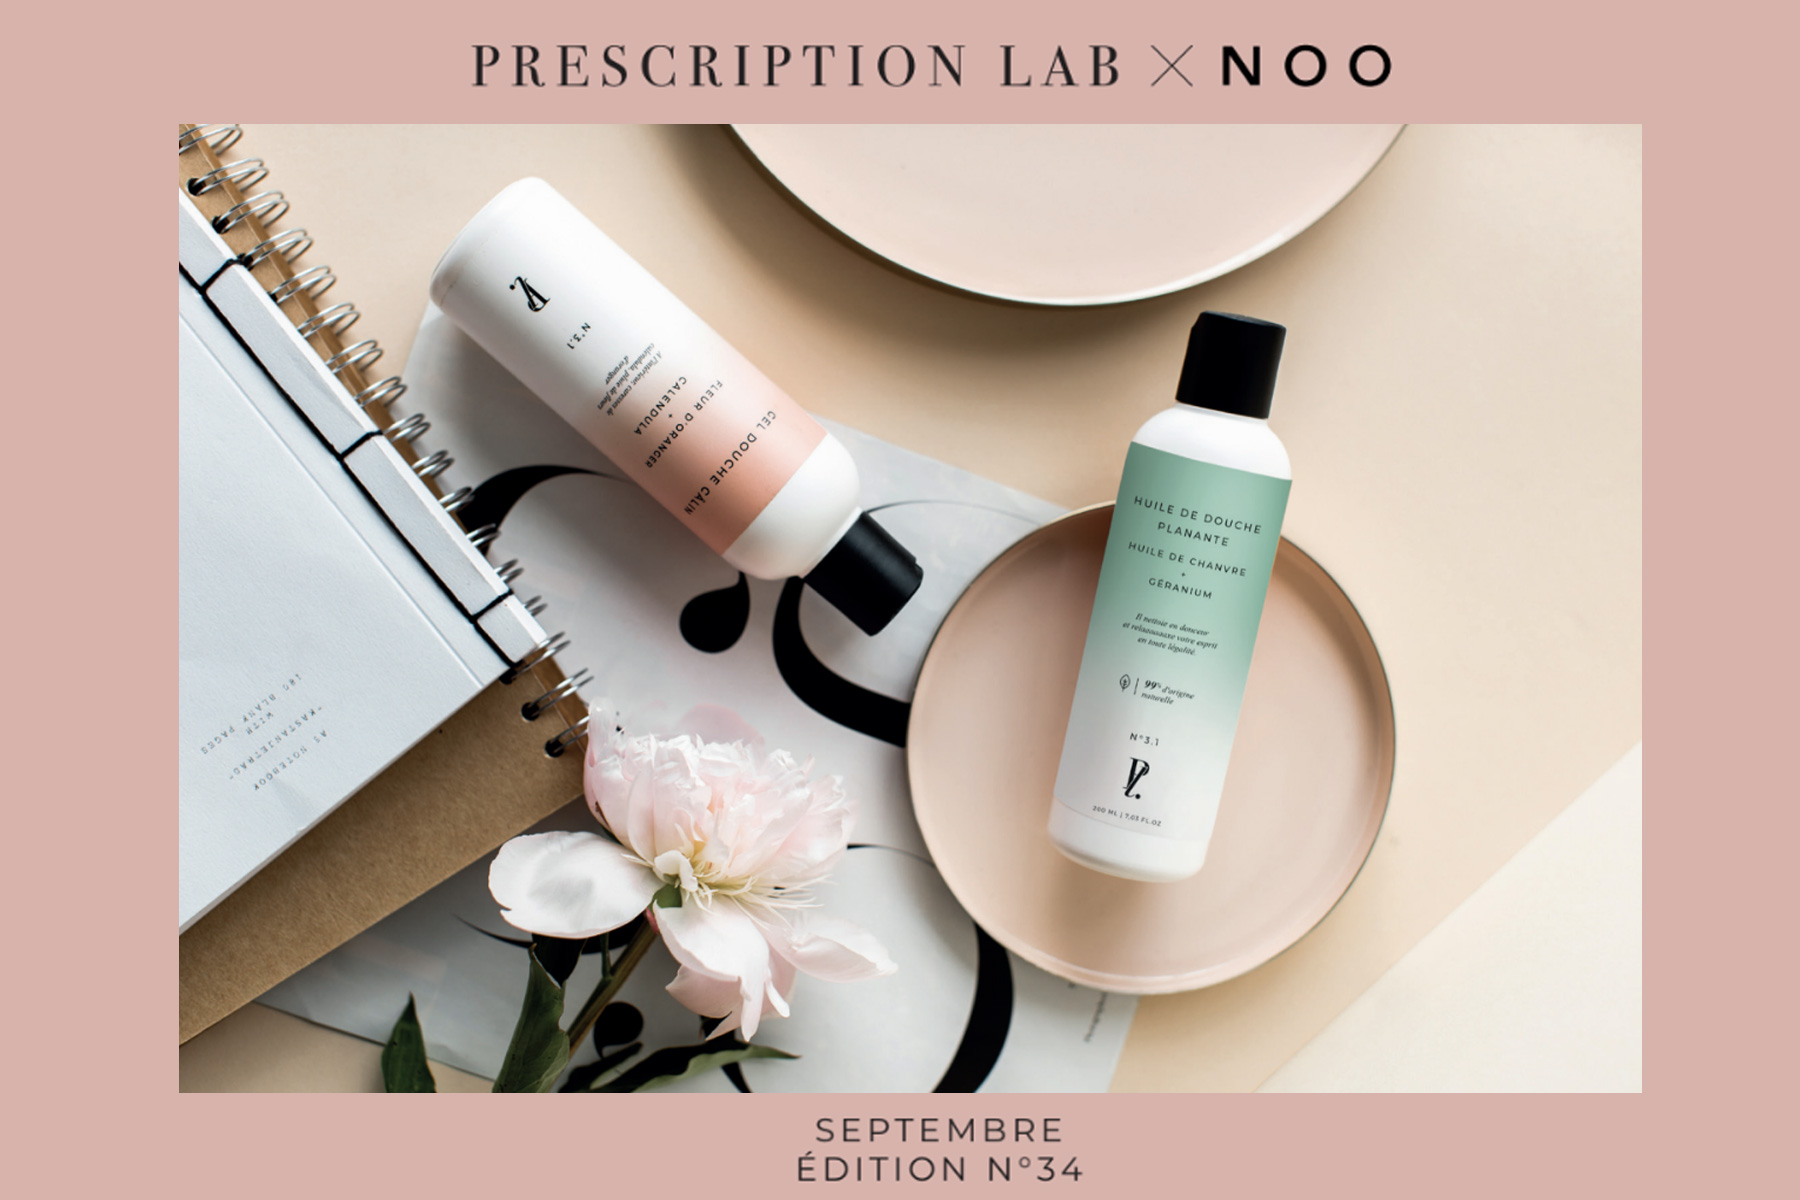 prescription-lab-septembre-2019-spoiler